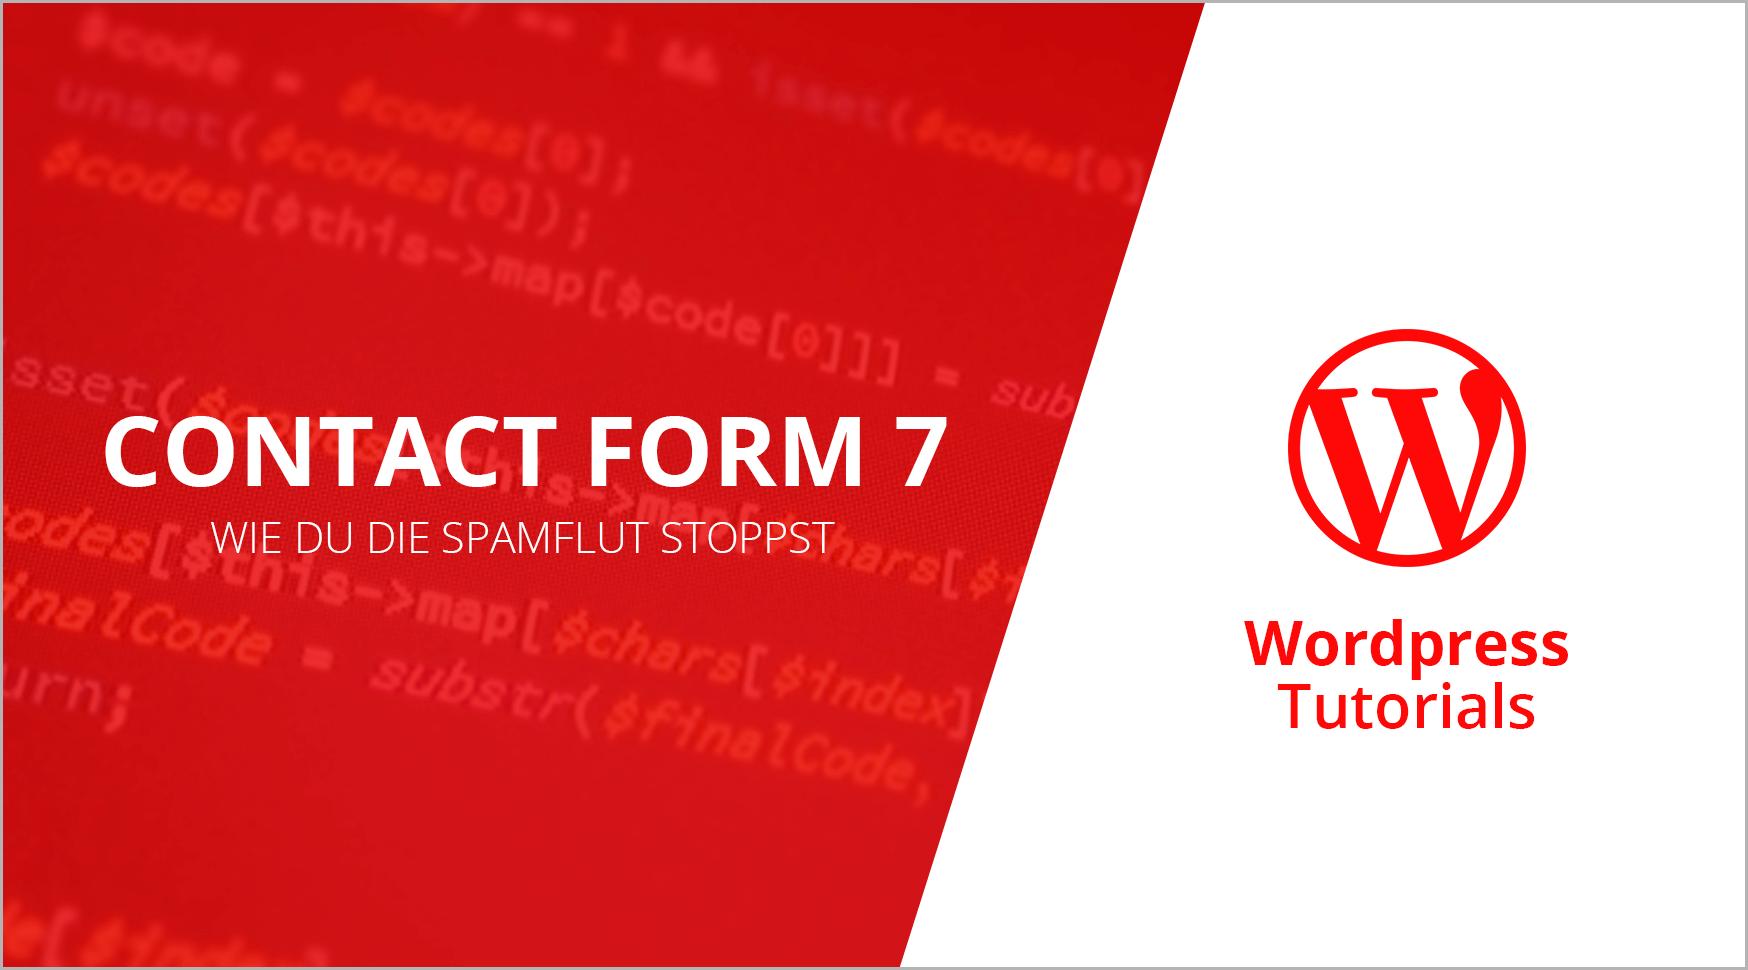 contact form 7 wordpress